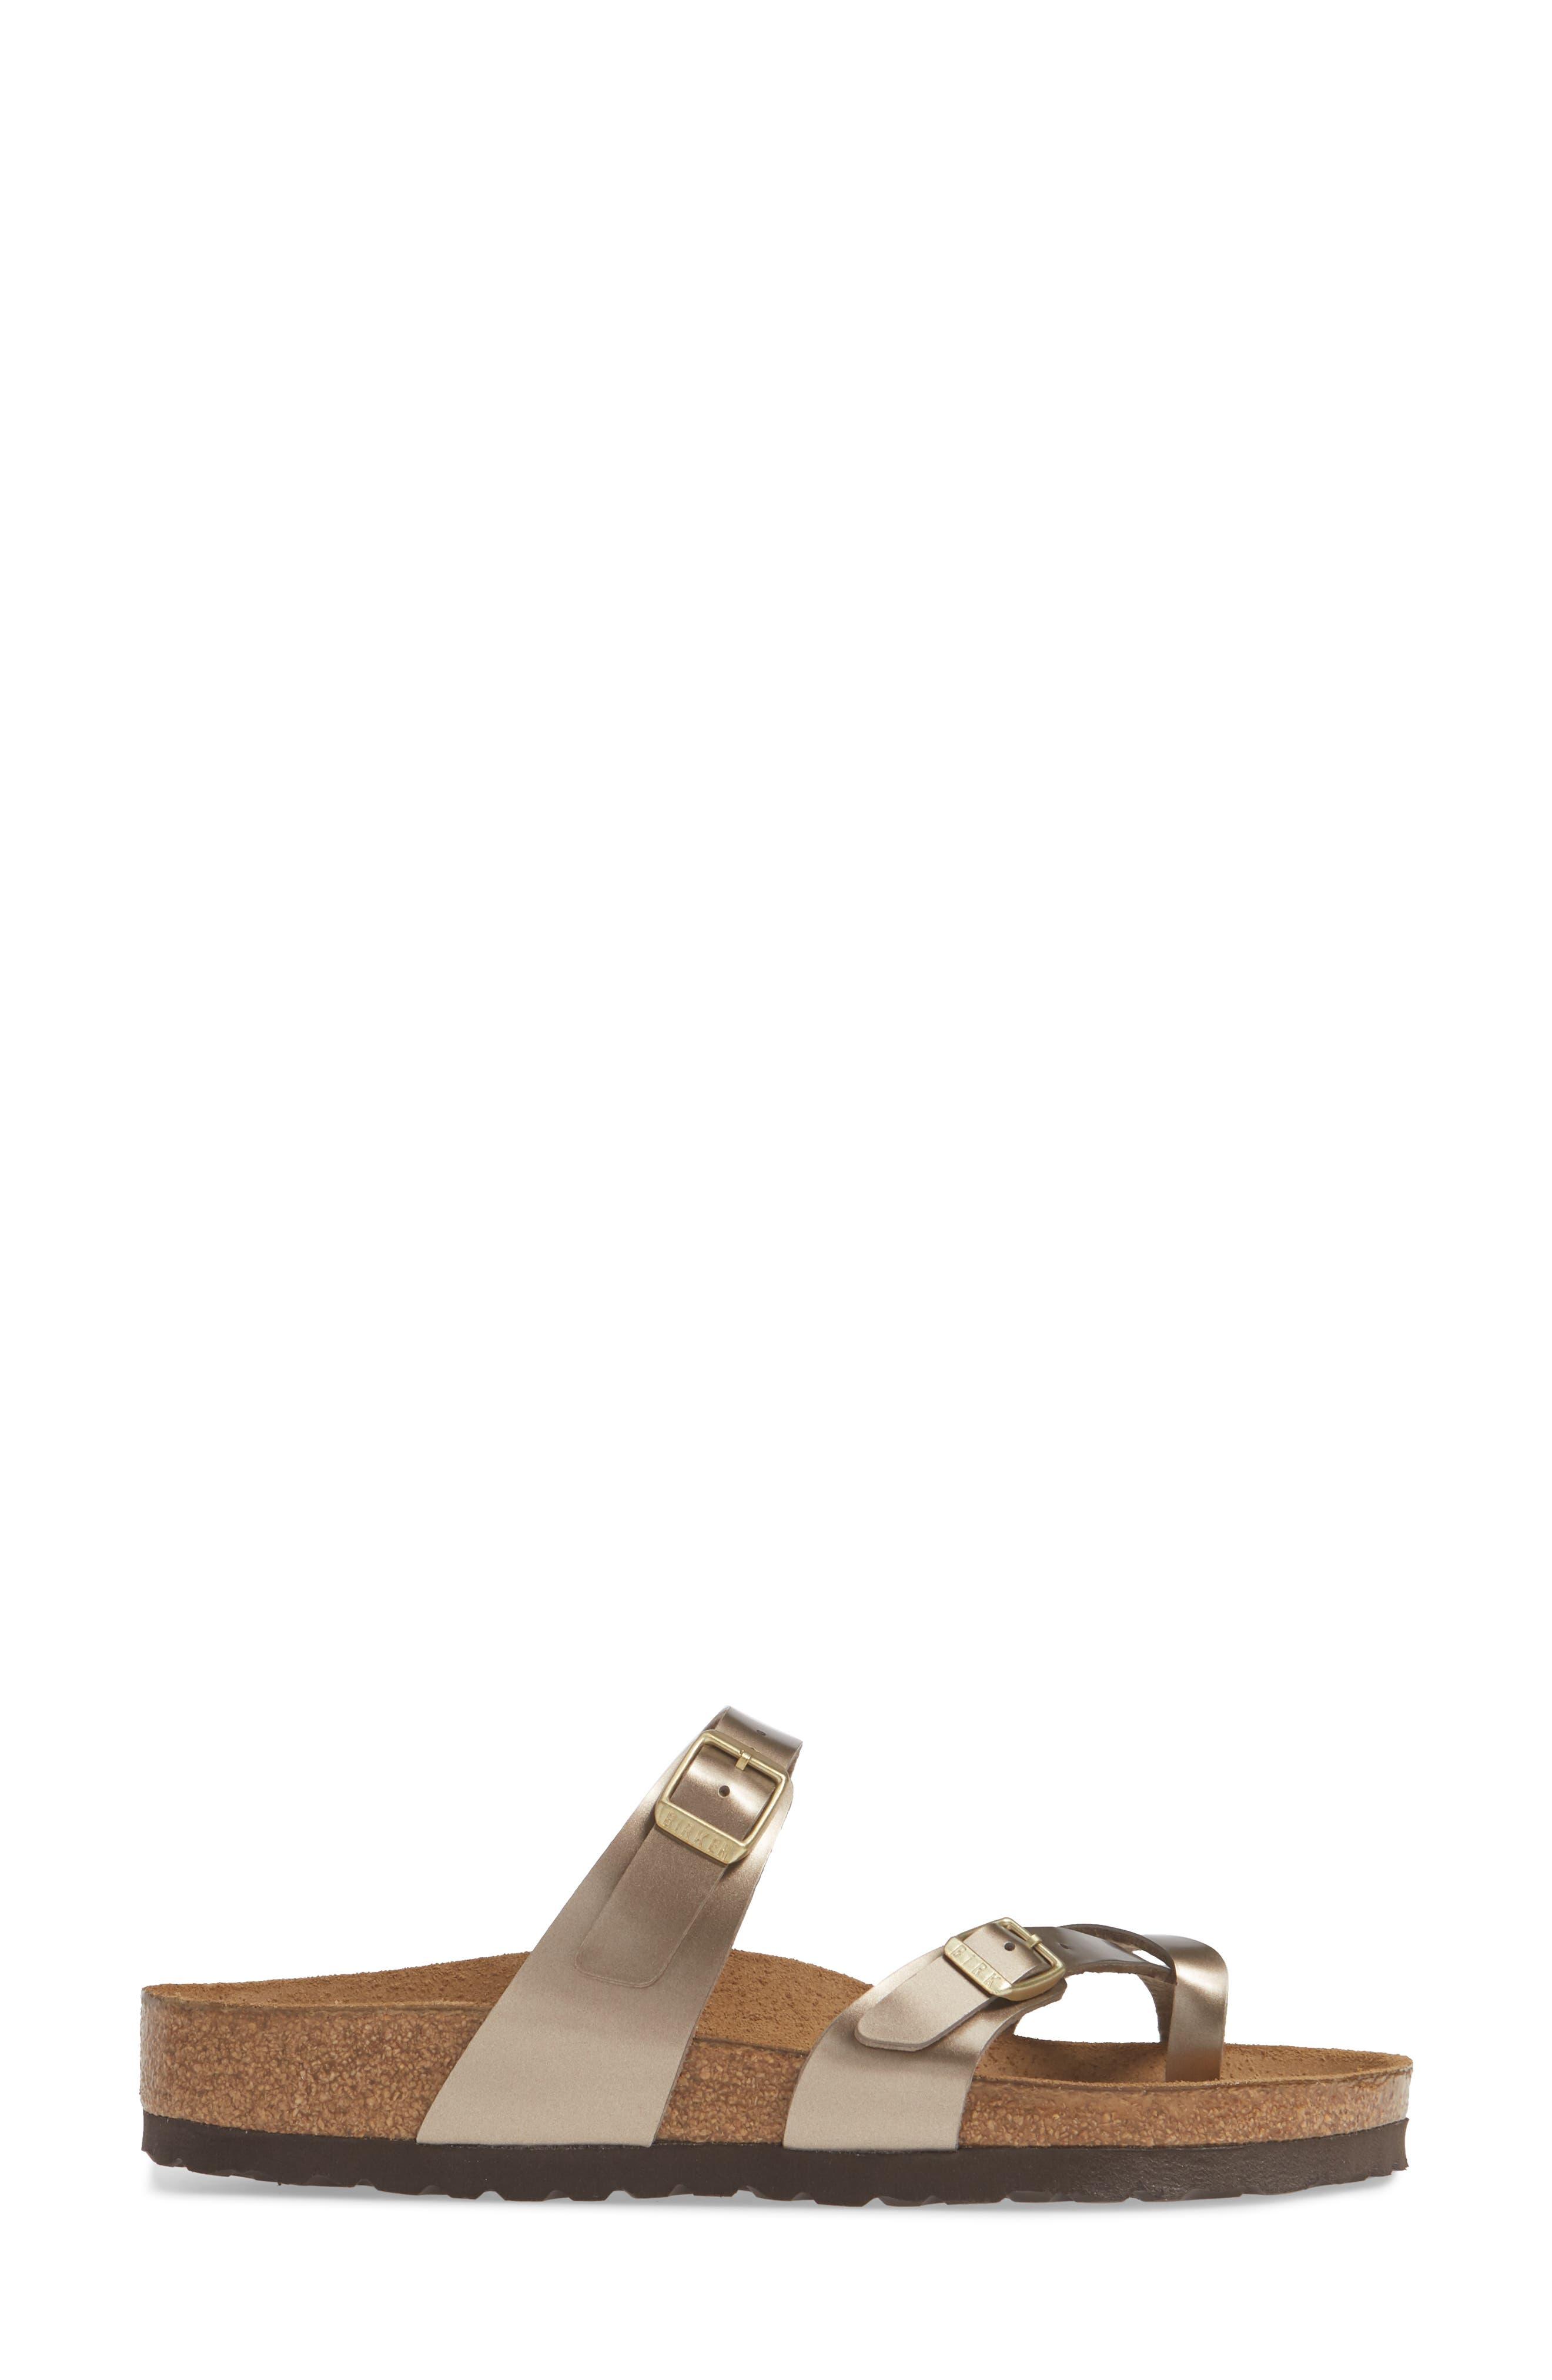 ,                             Mayari Slide Sandal,                             Alternate thumbnail 3, color,                             ELECTRIC METALLIC TAUPE